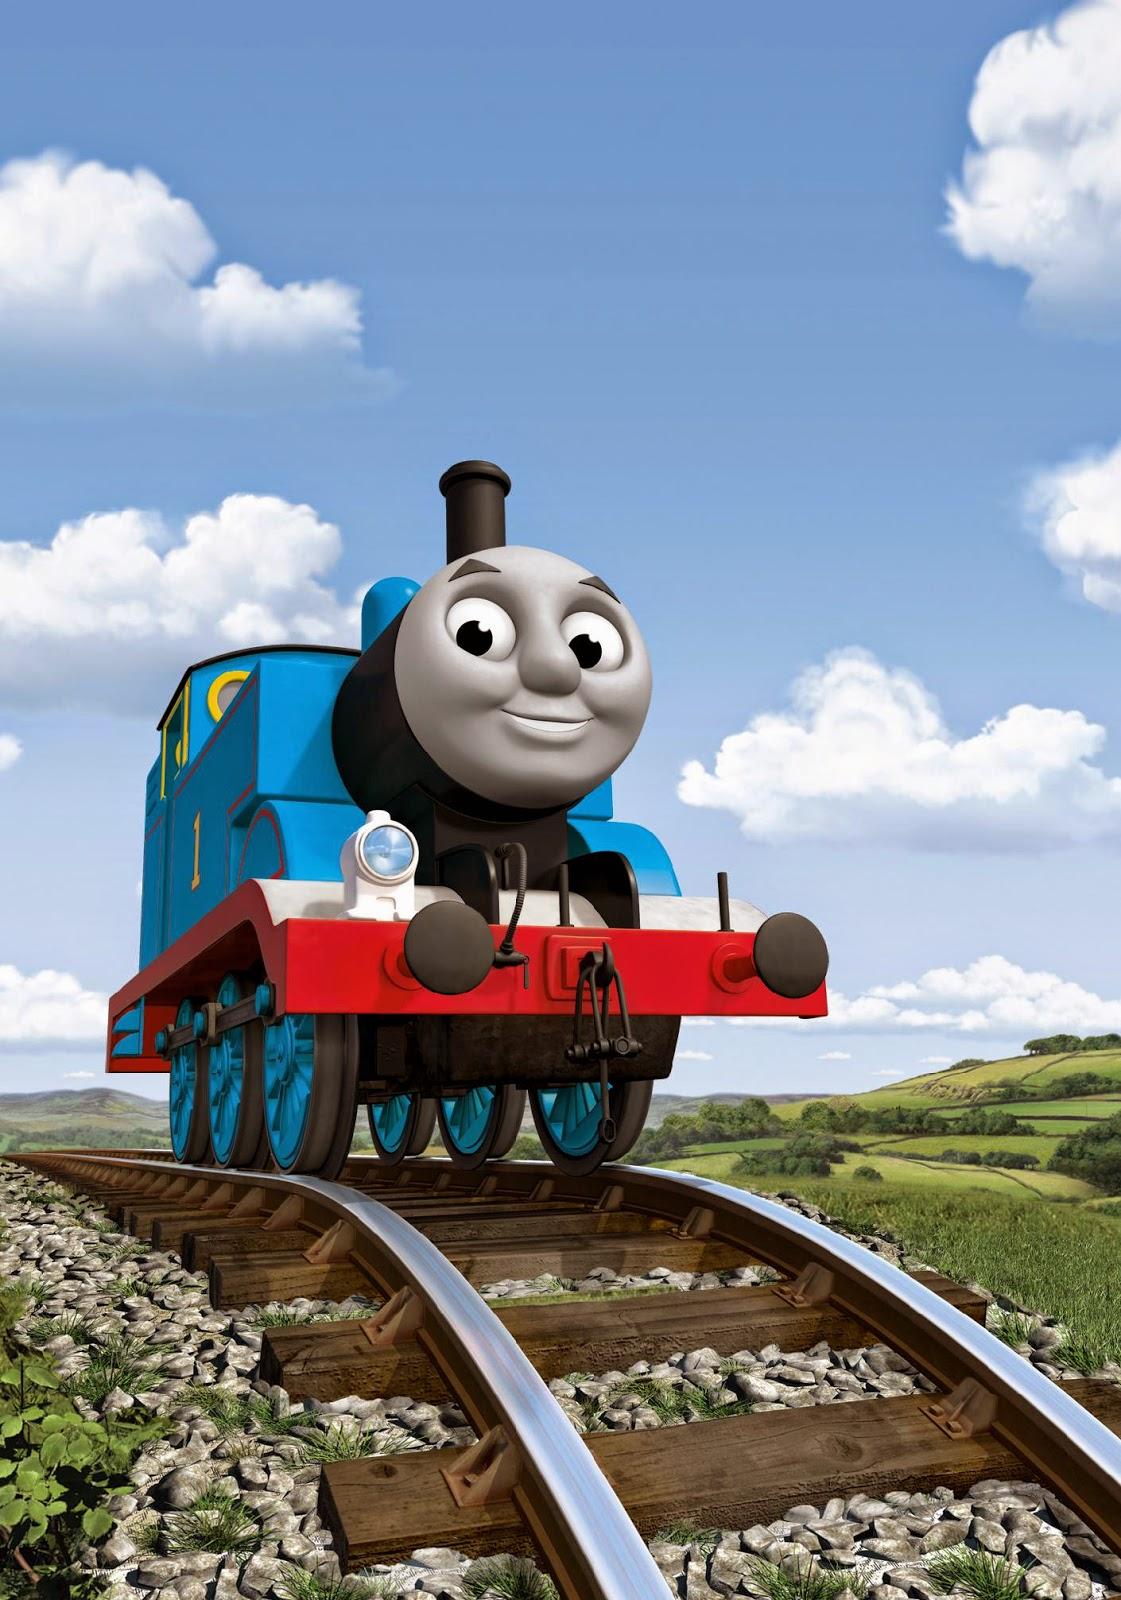 Gambar Thomas & Friends Wallpaper HD Tank Engine | Gambar ...